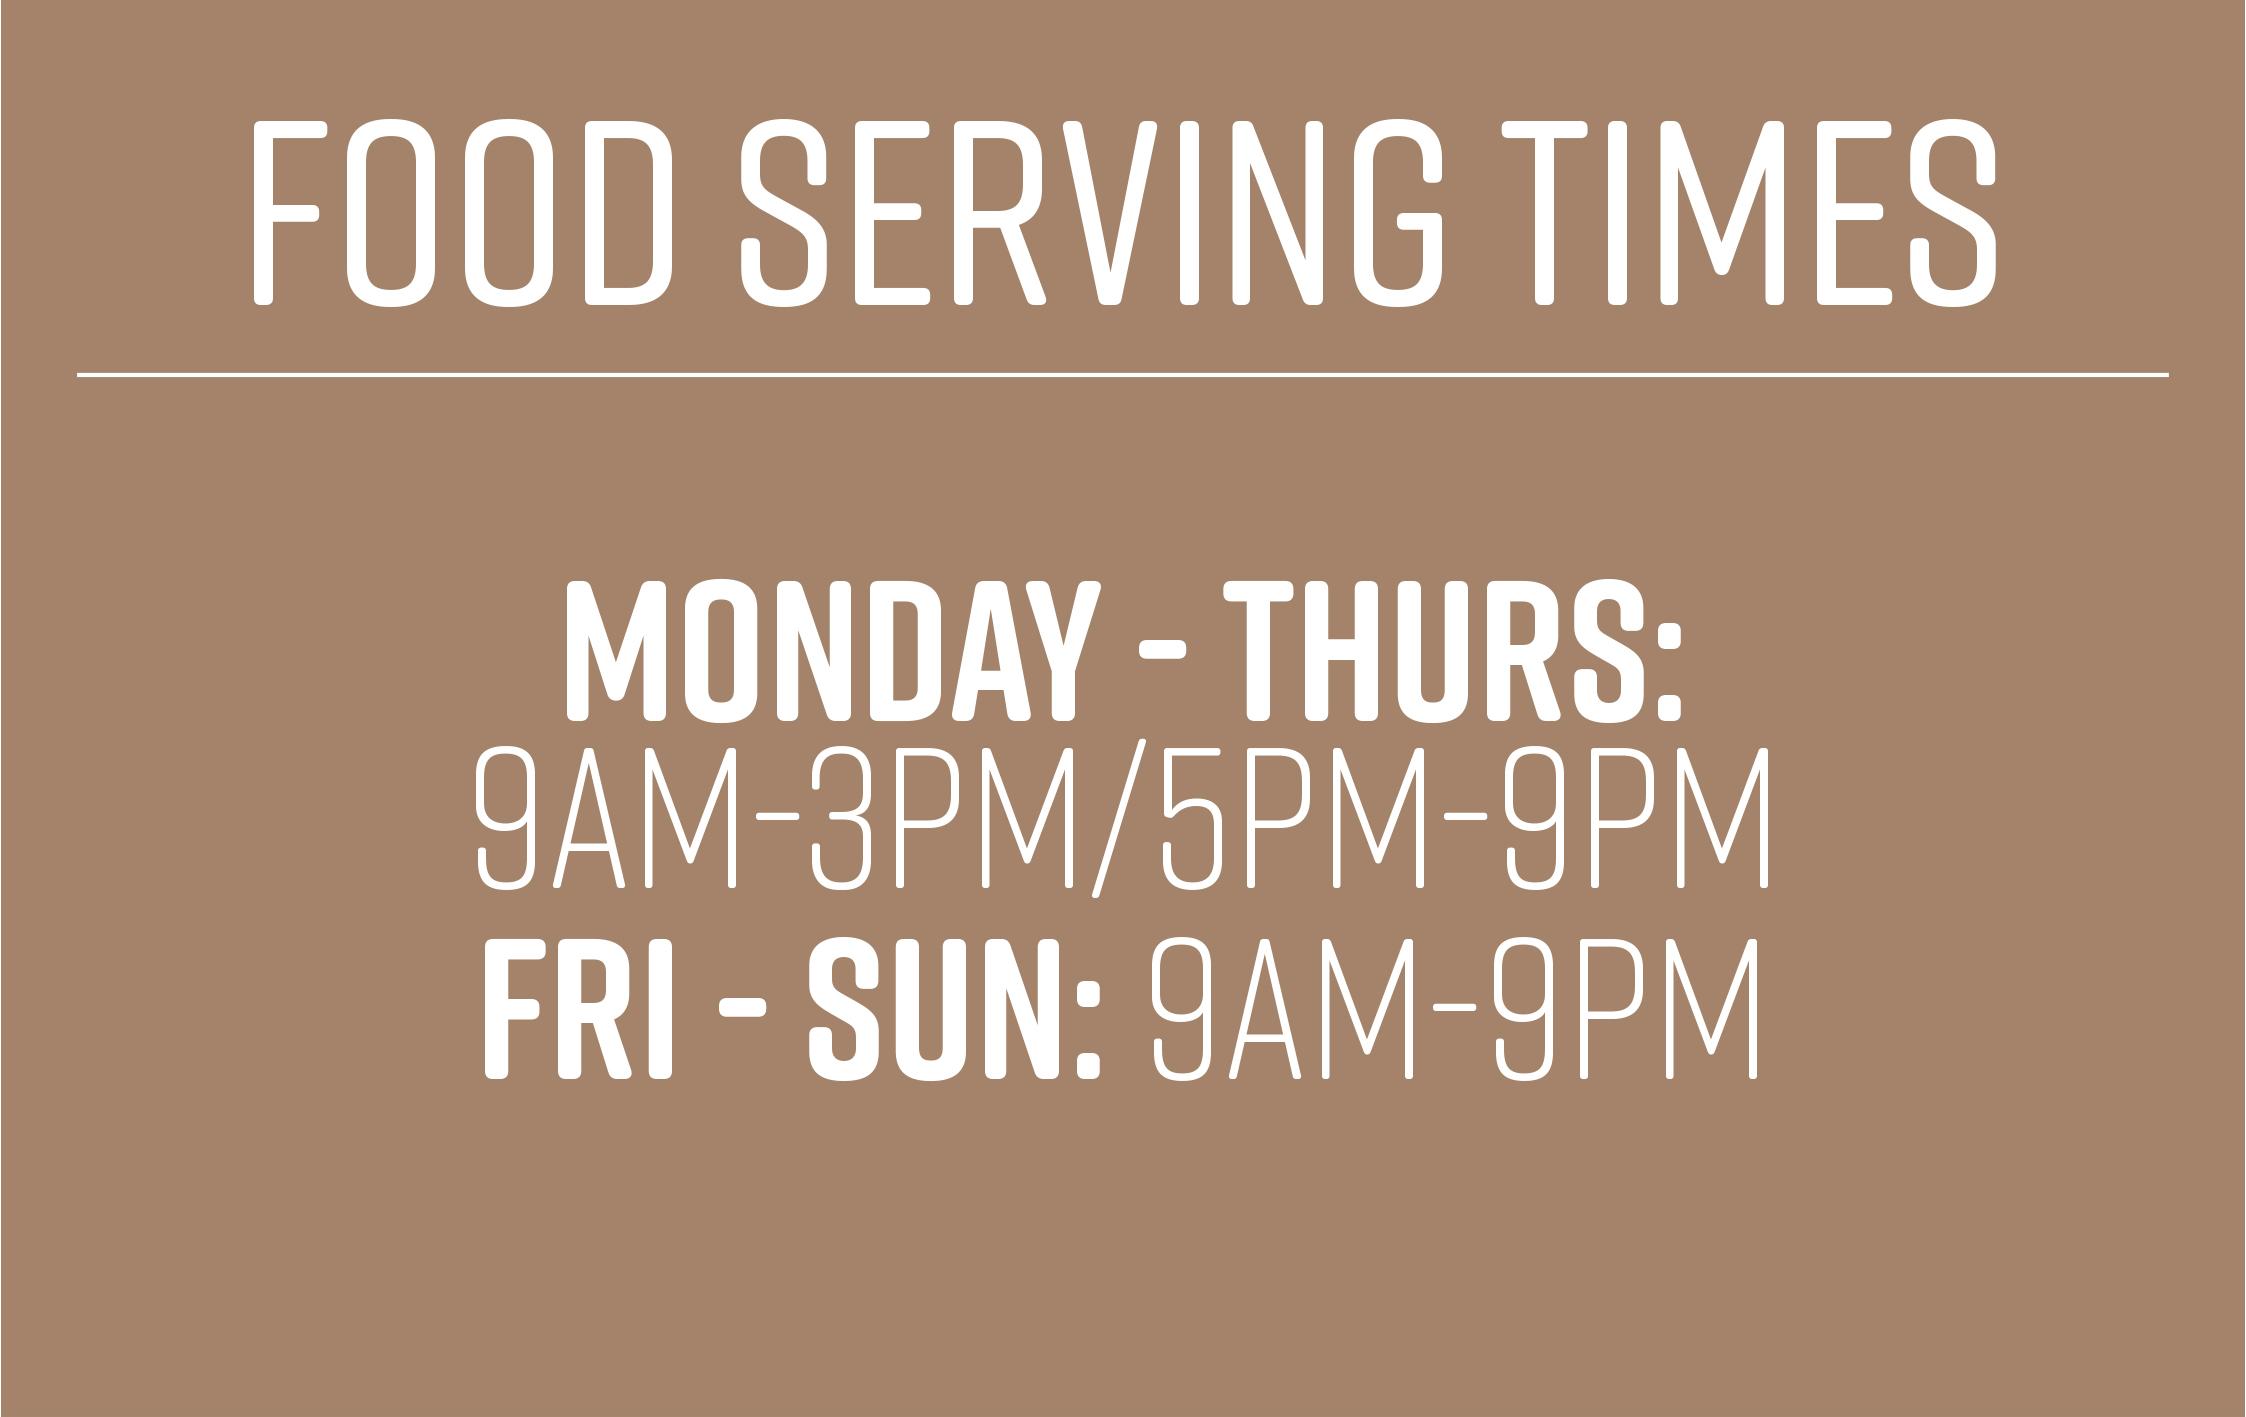 Food Serving Hours